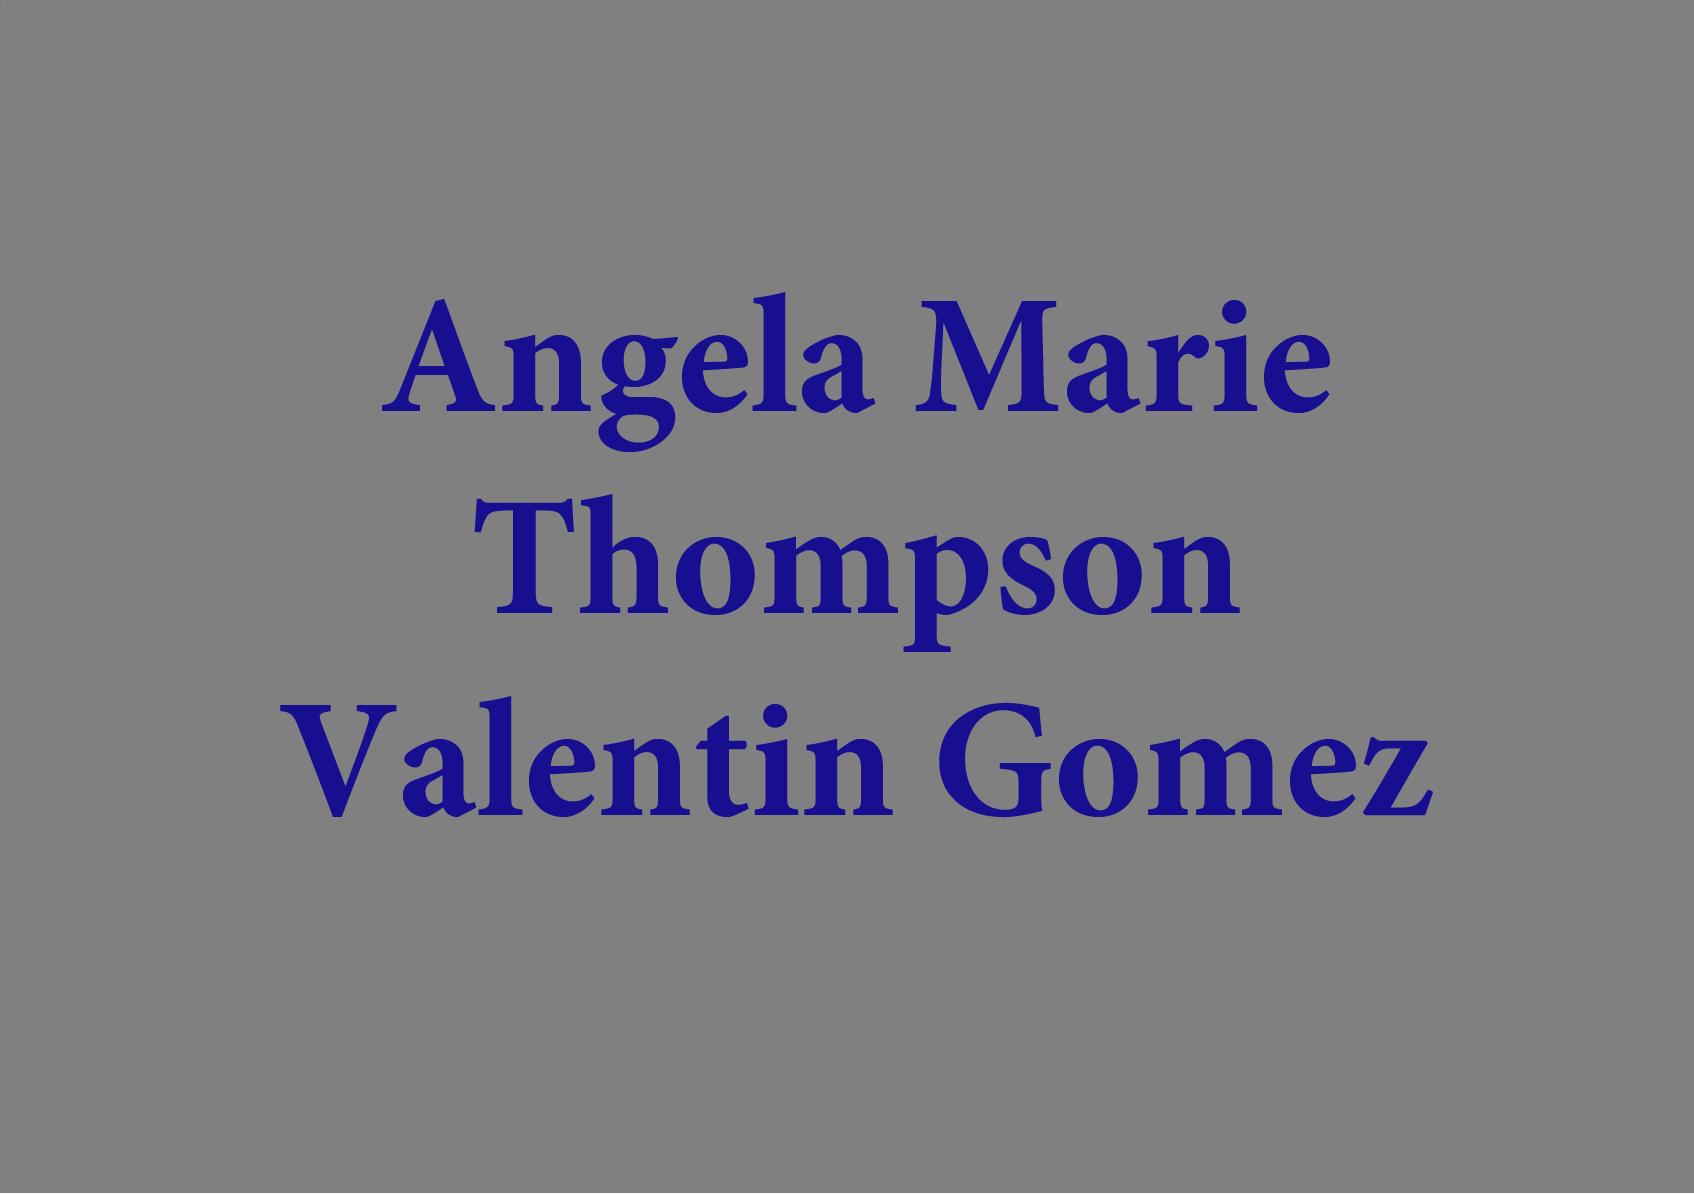 angela marie thompson valentin Gomez.png